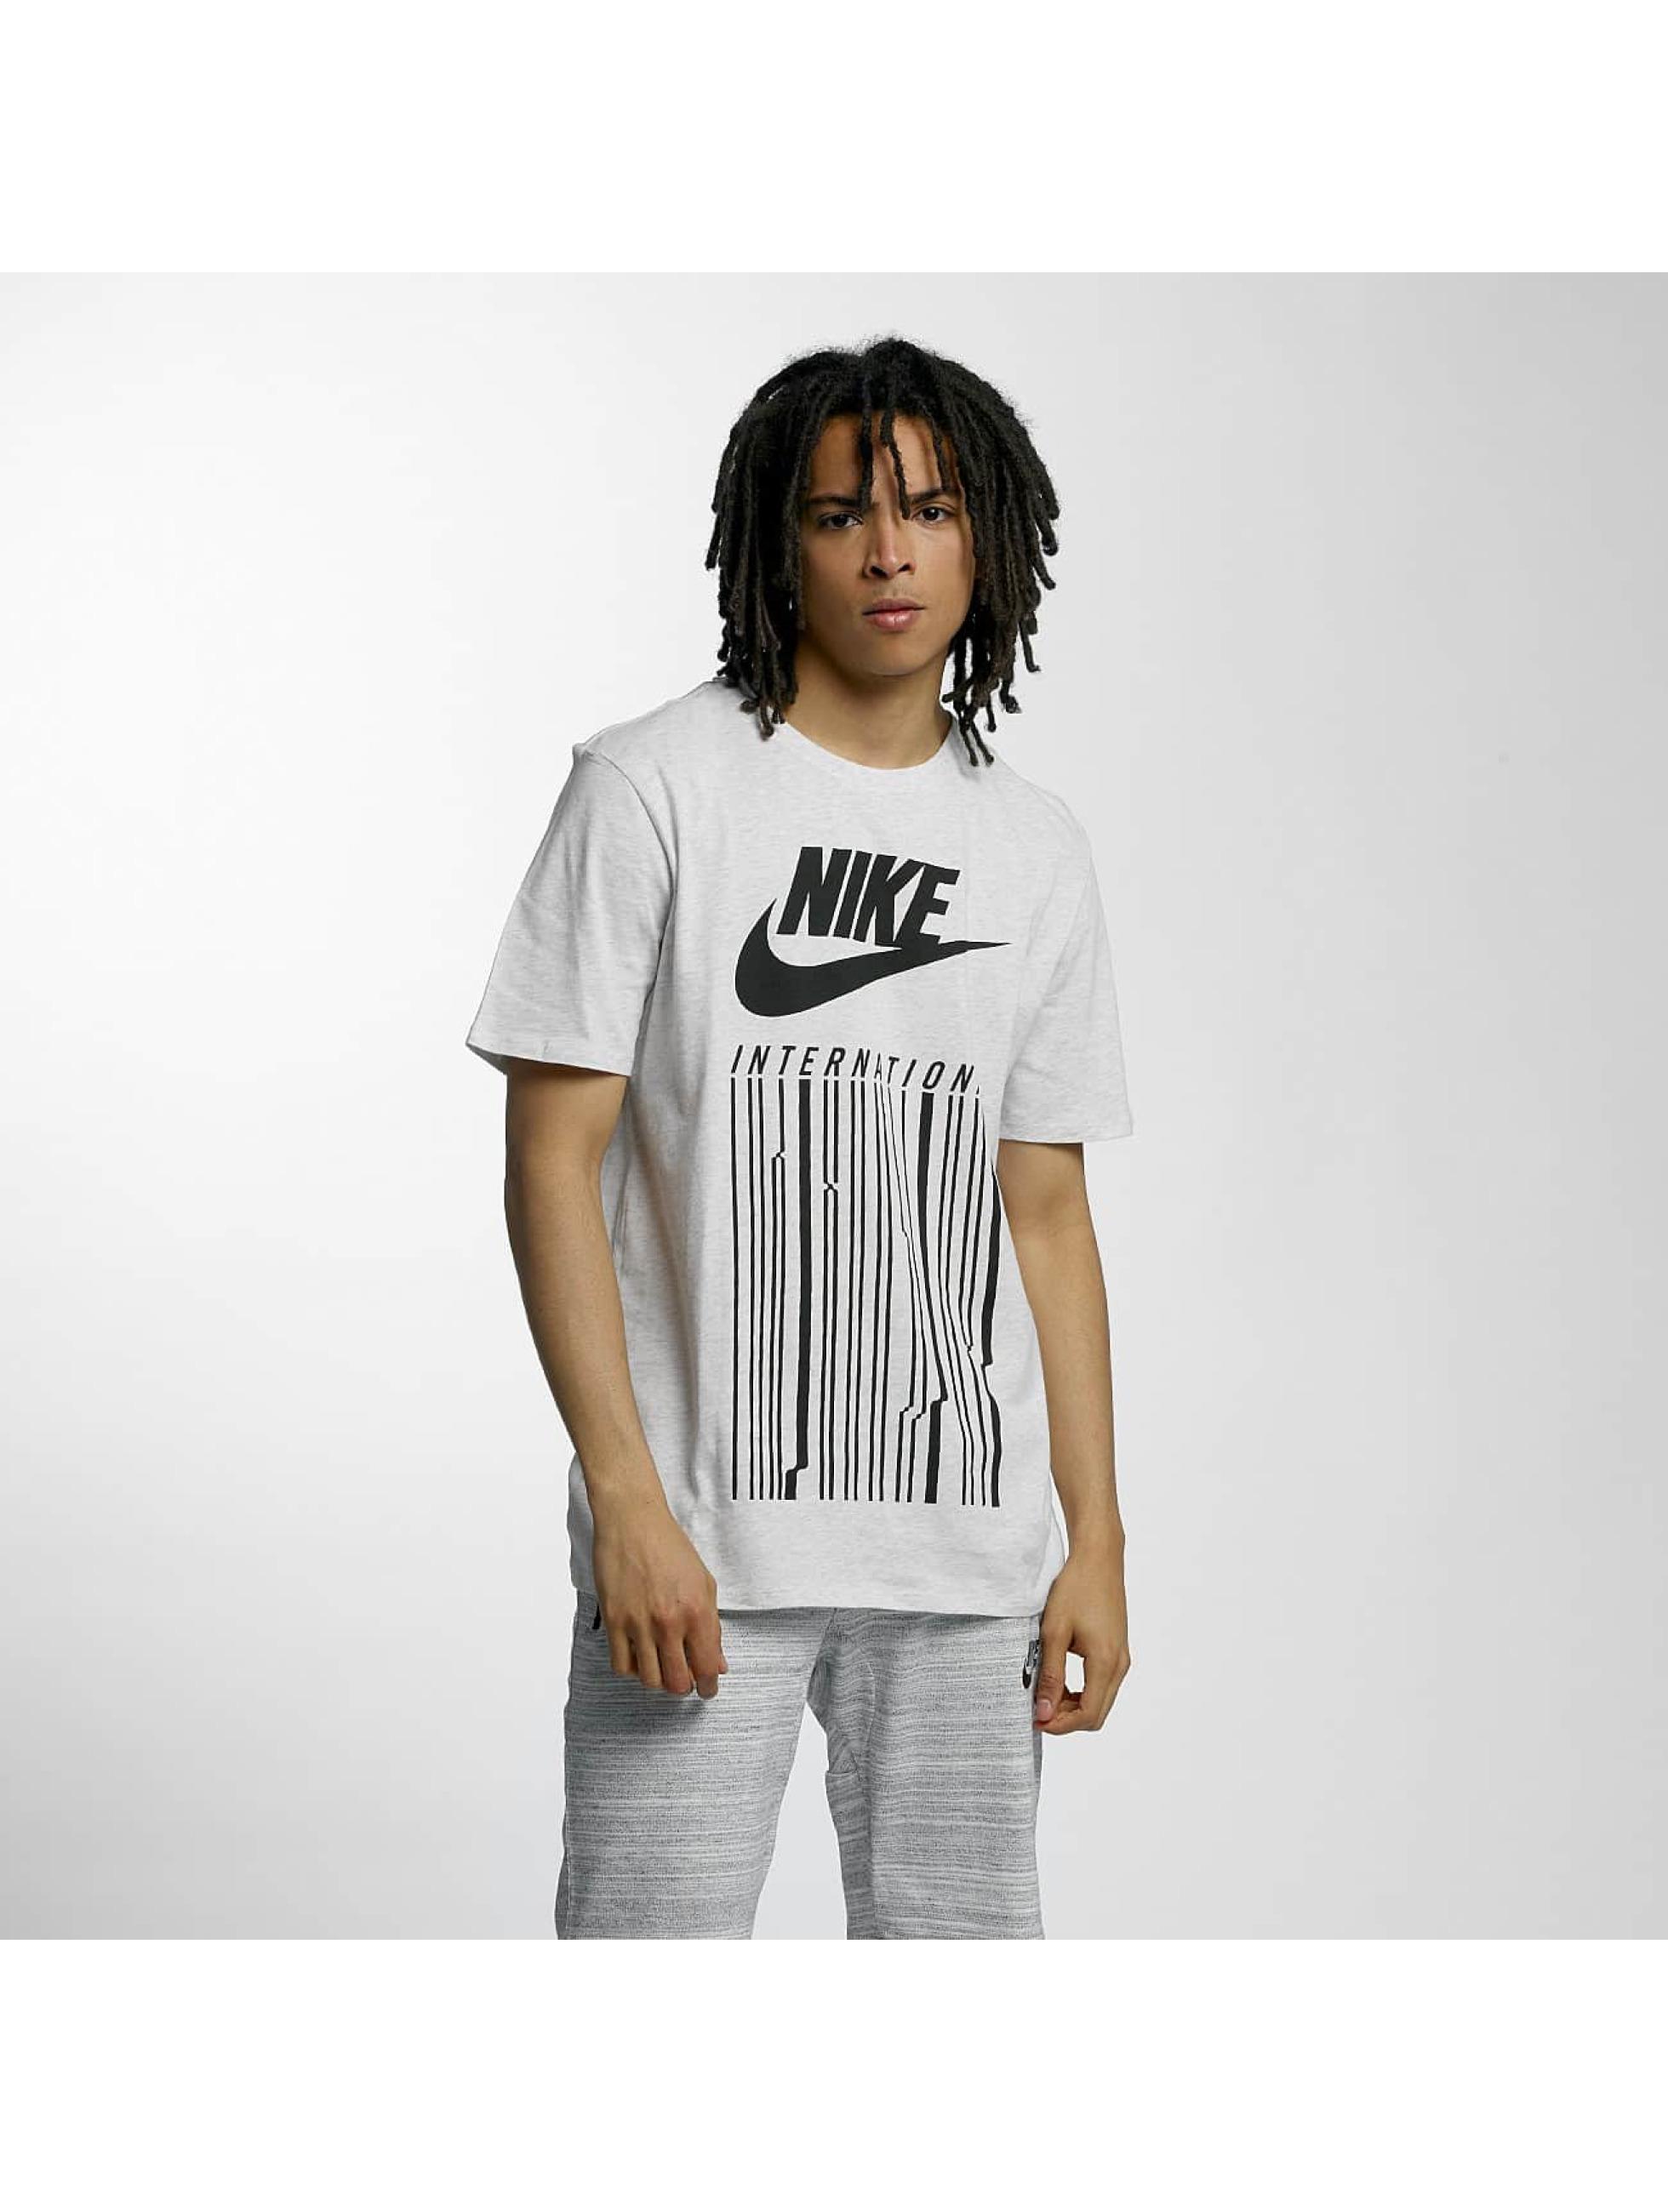 Nike Tričká INTL 1 šedá